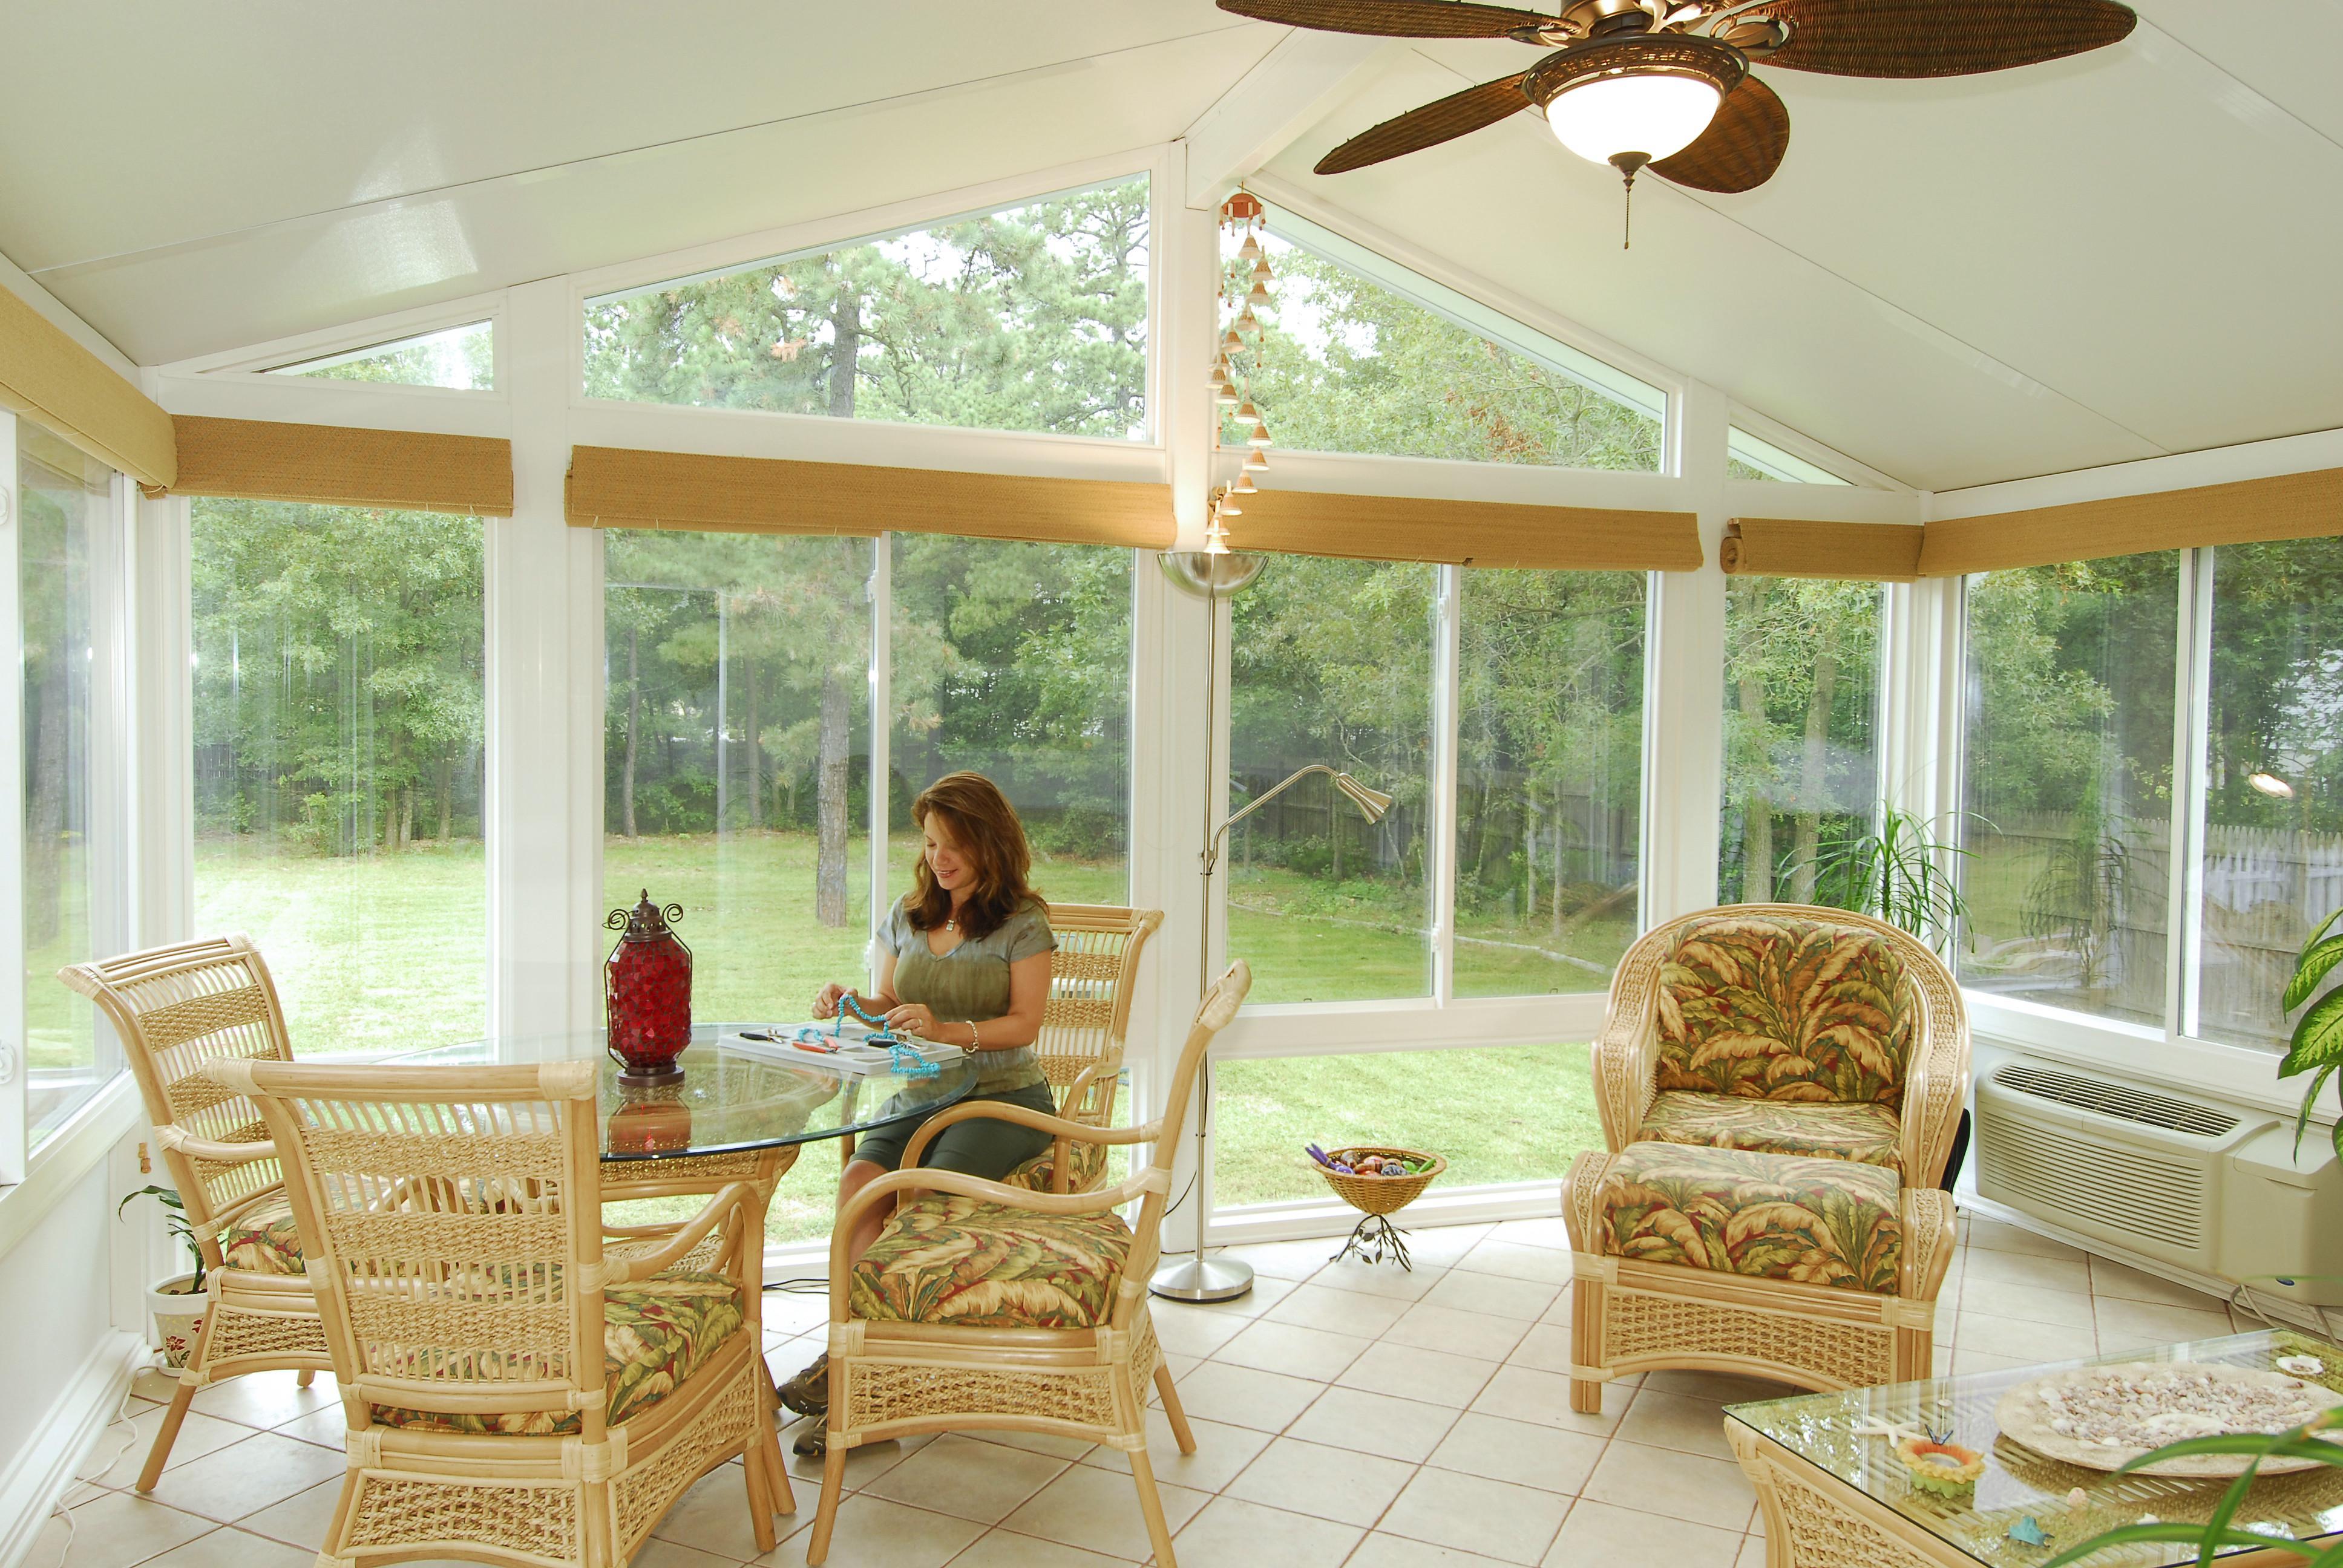 Four seasons sunrooms in utica mi 586 232 5 for 4 season sun room